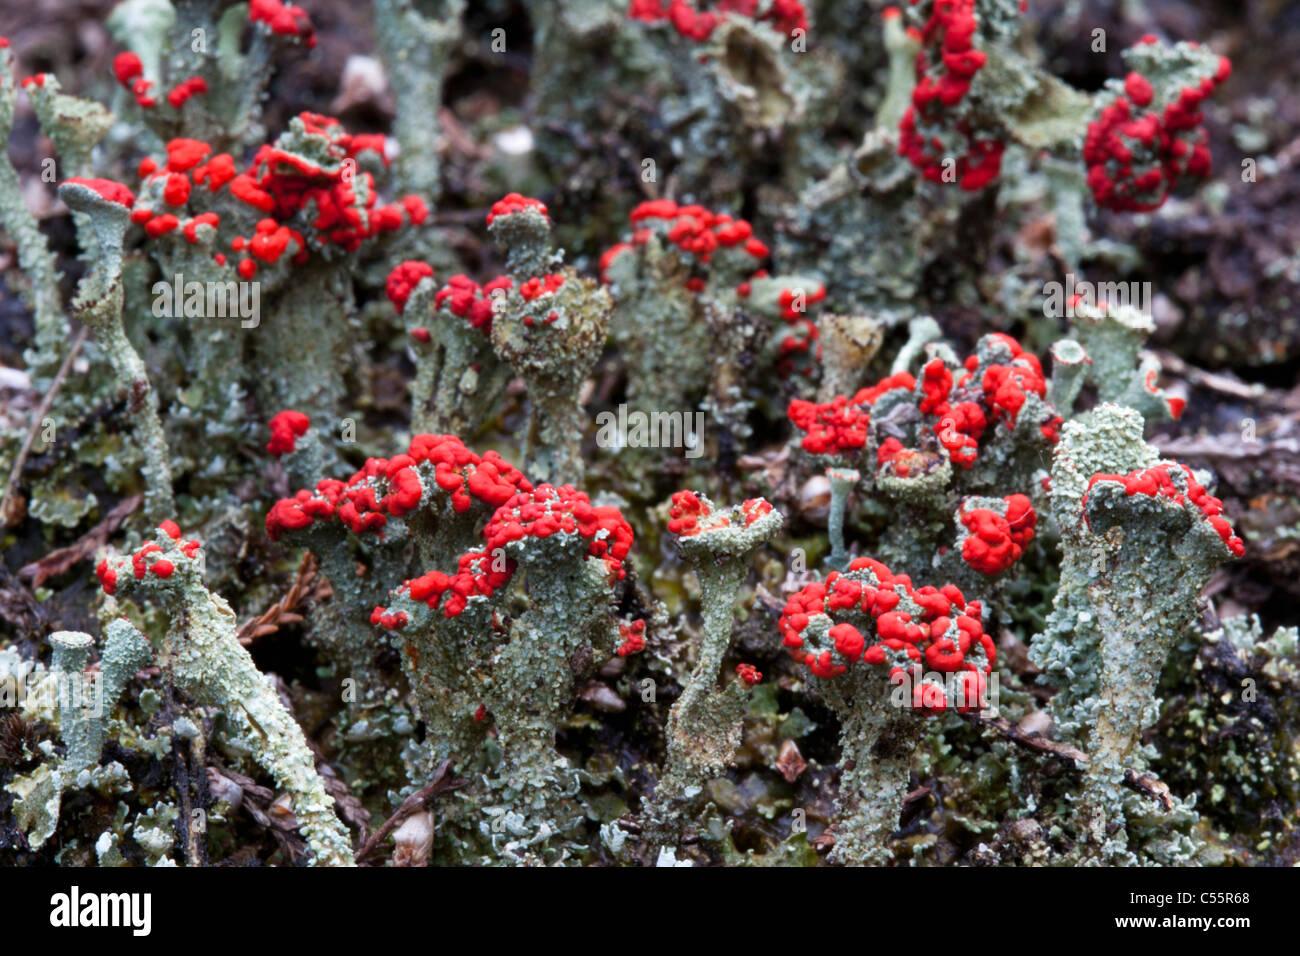 Den Niederlanden, Loon Op Zand, Nationalpark De Loonse En Drunense Duinen. Typische Pflanzen. Stockbild